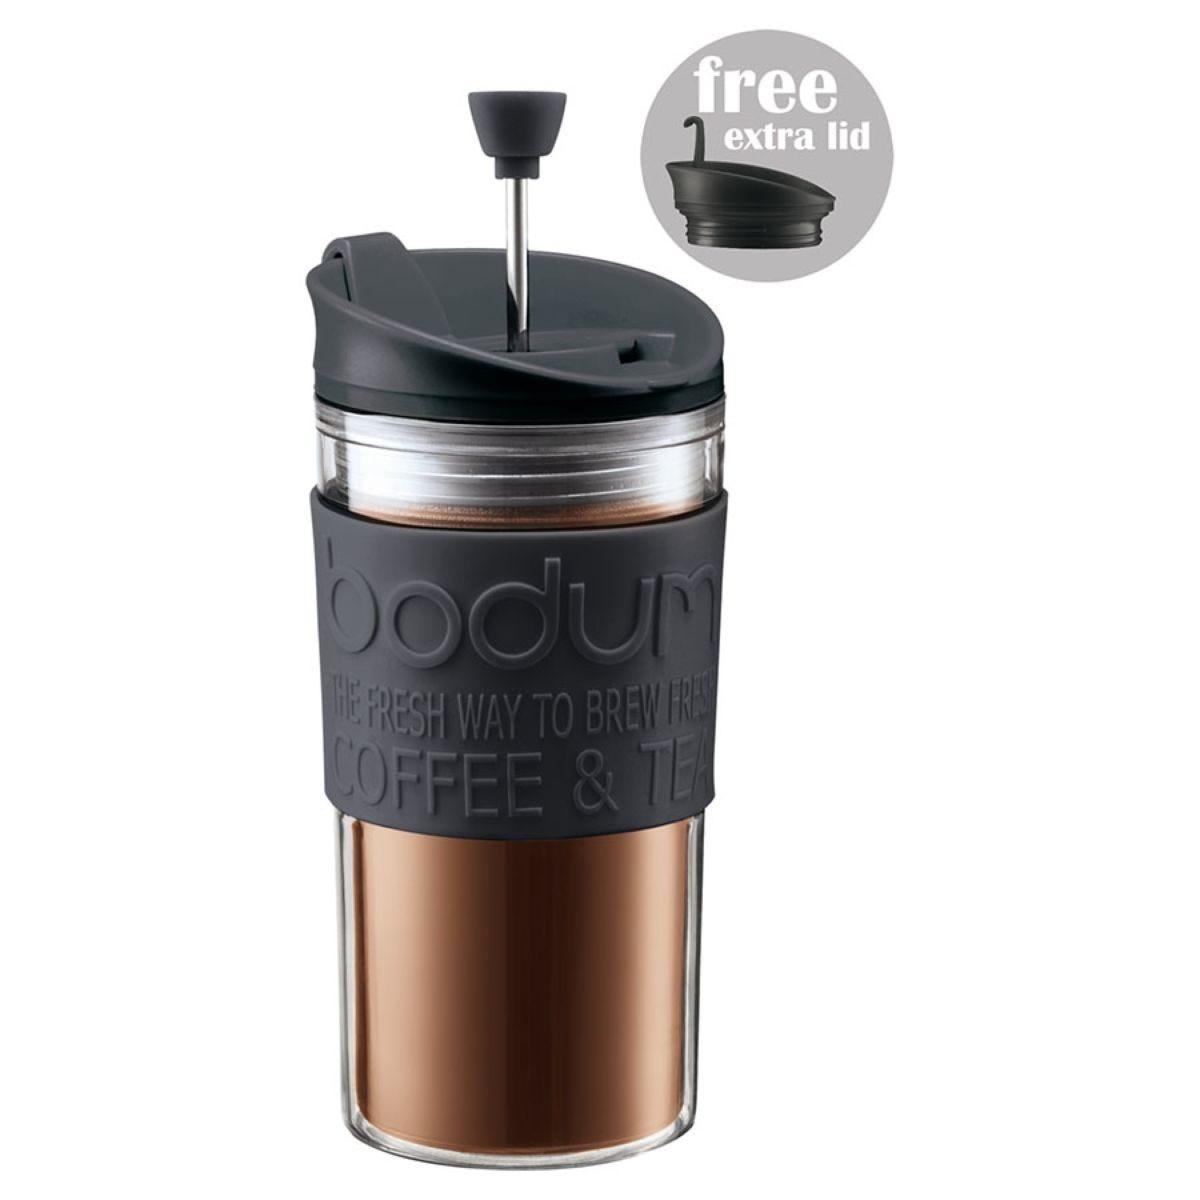 Bodum 350ml Travel Coffee Press – Black